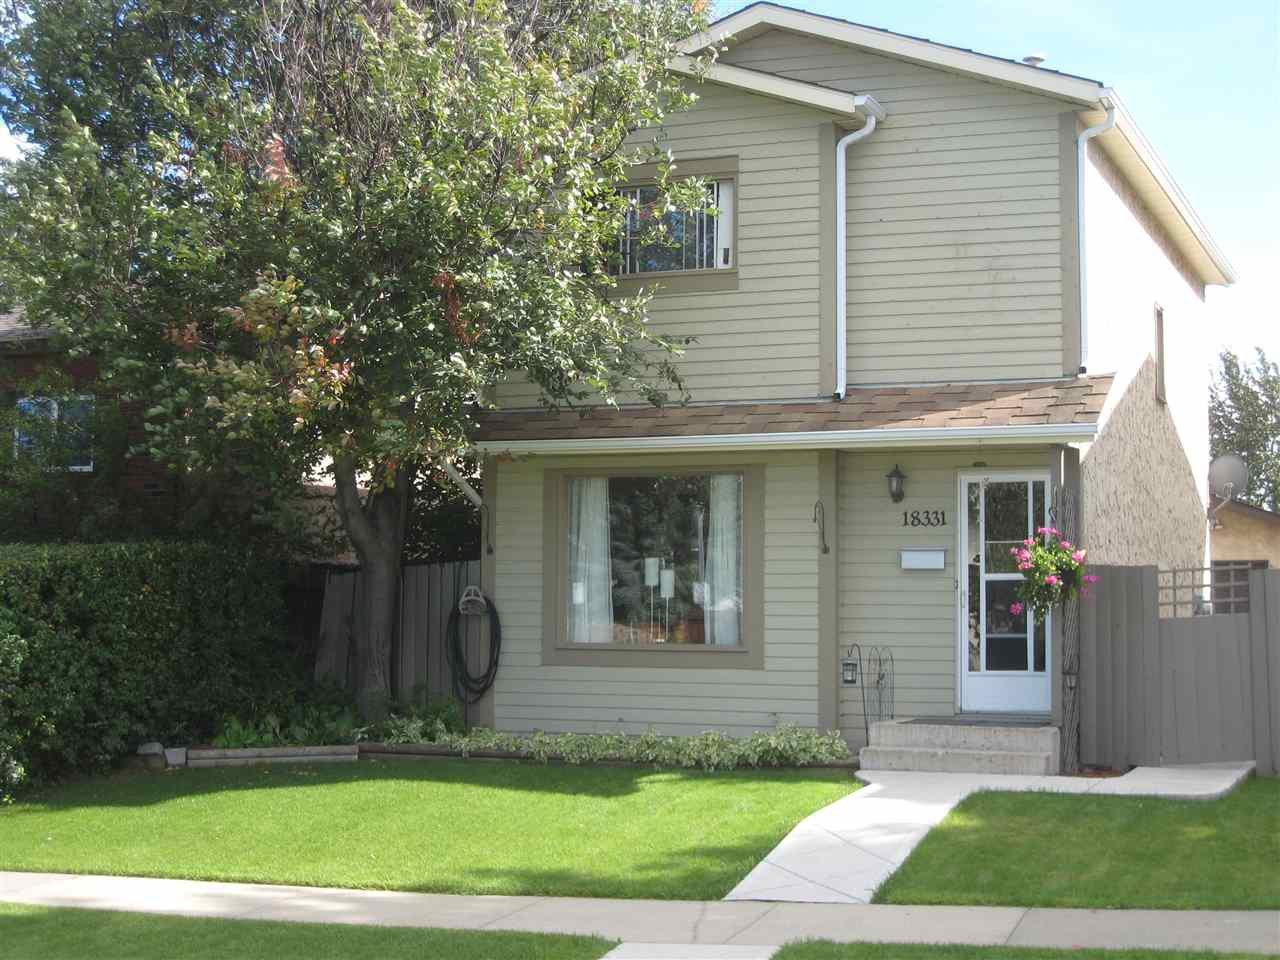 Main Photo: 18331 76 Avenue in Edmonton: Zone 20 House for sale : MLS®# E4181515